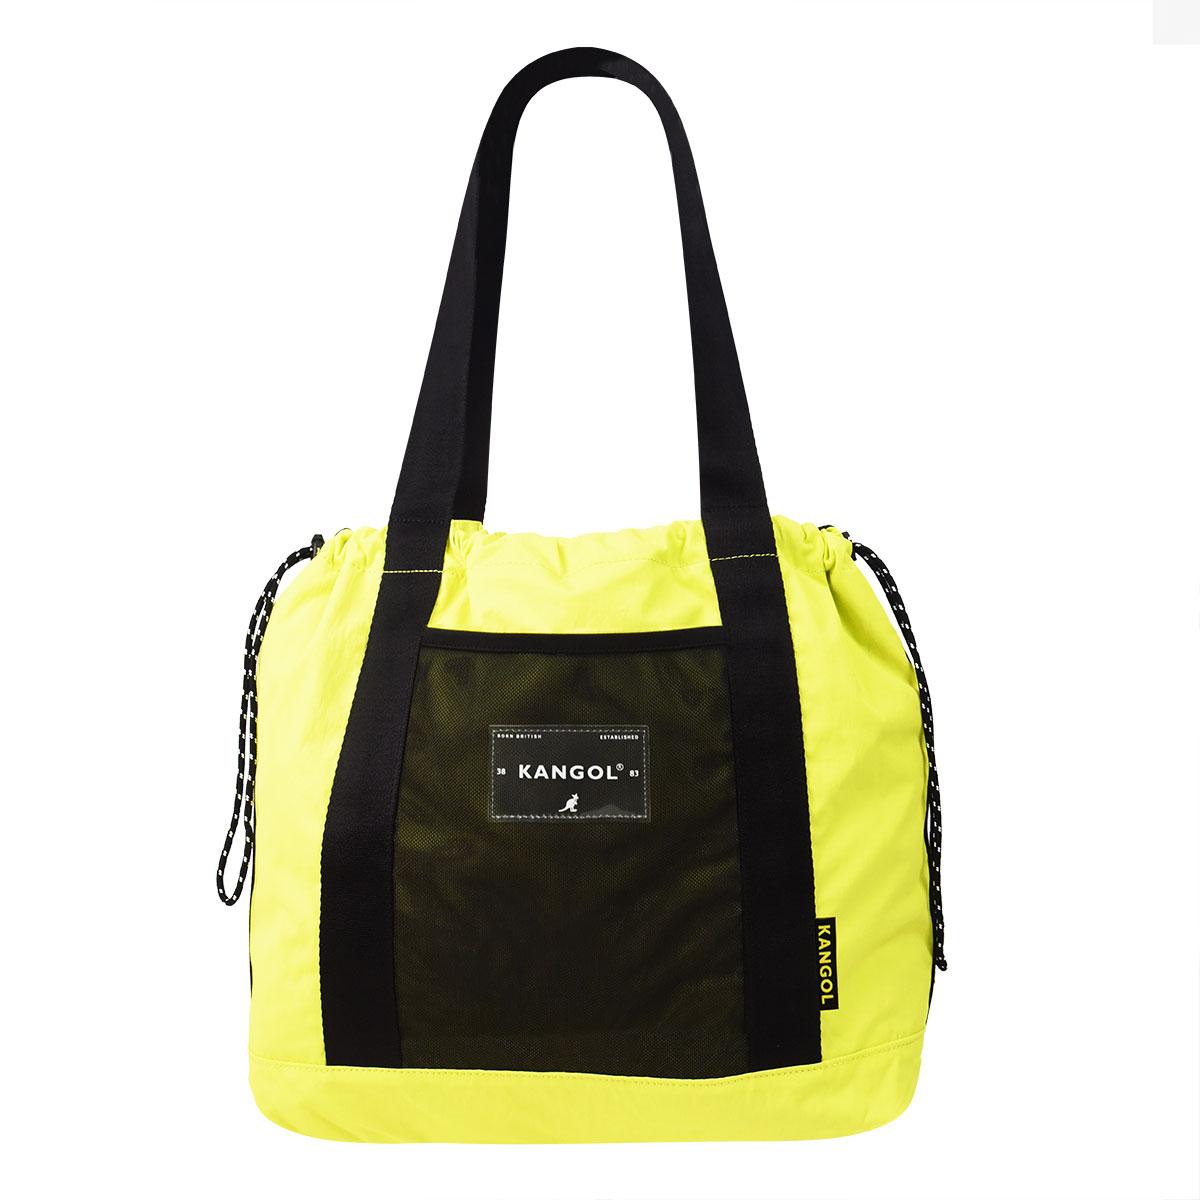 Kangol Casual Shopper in Lemon